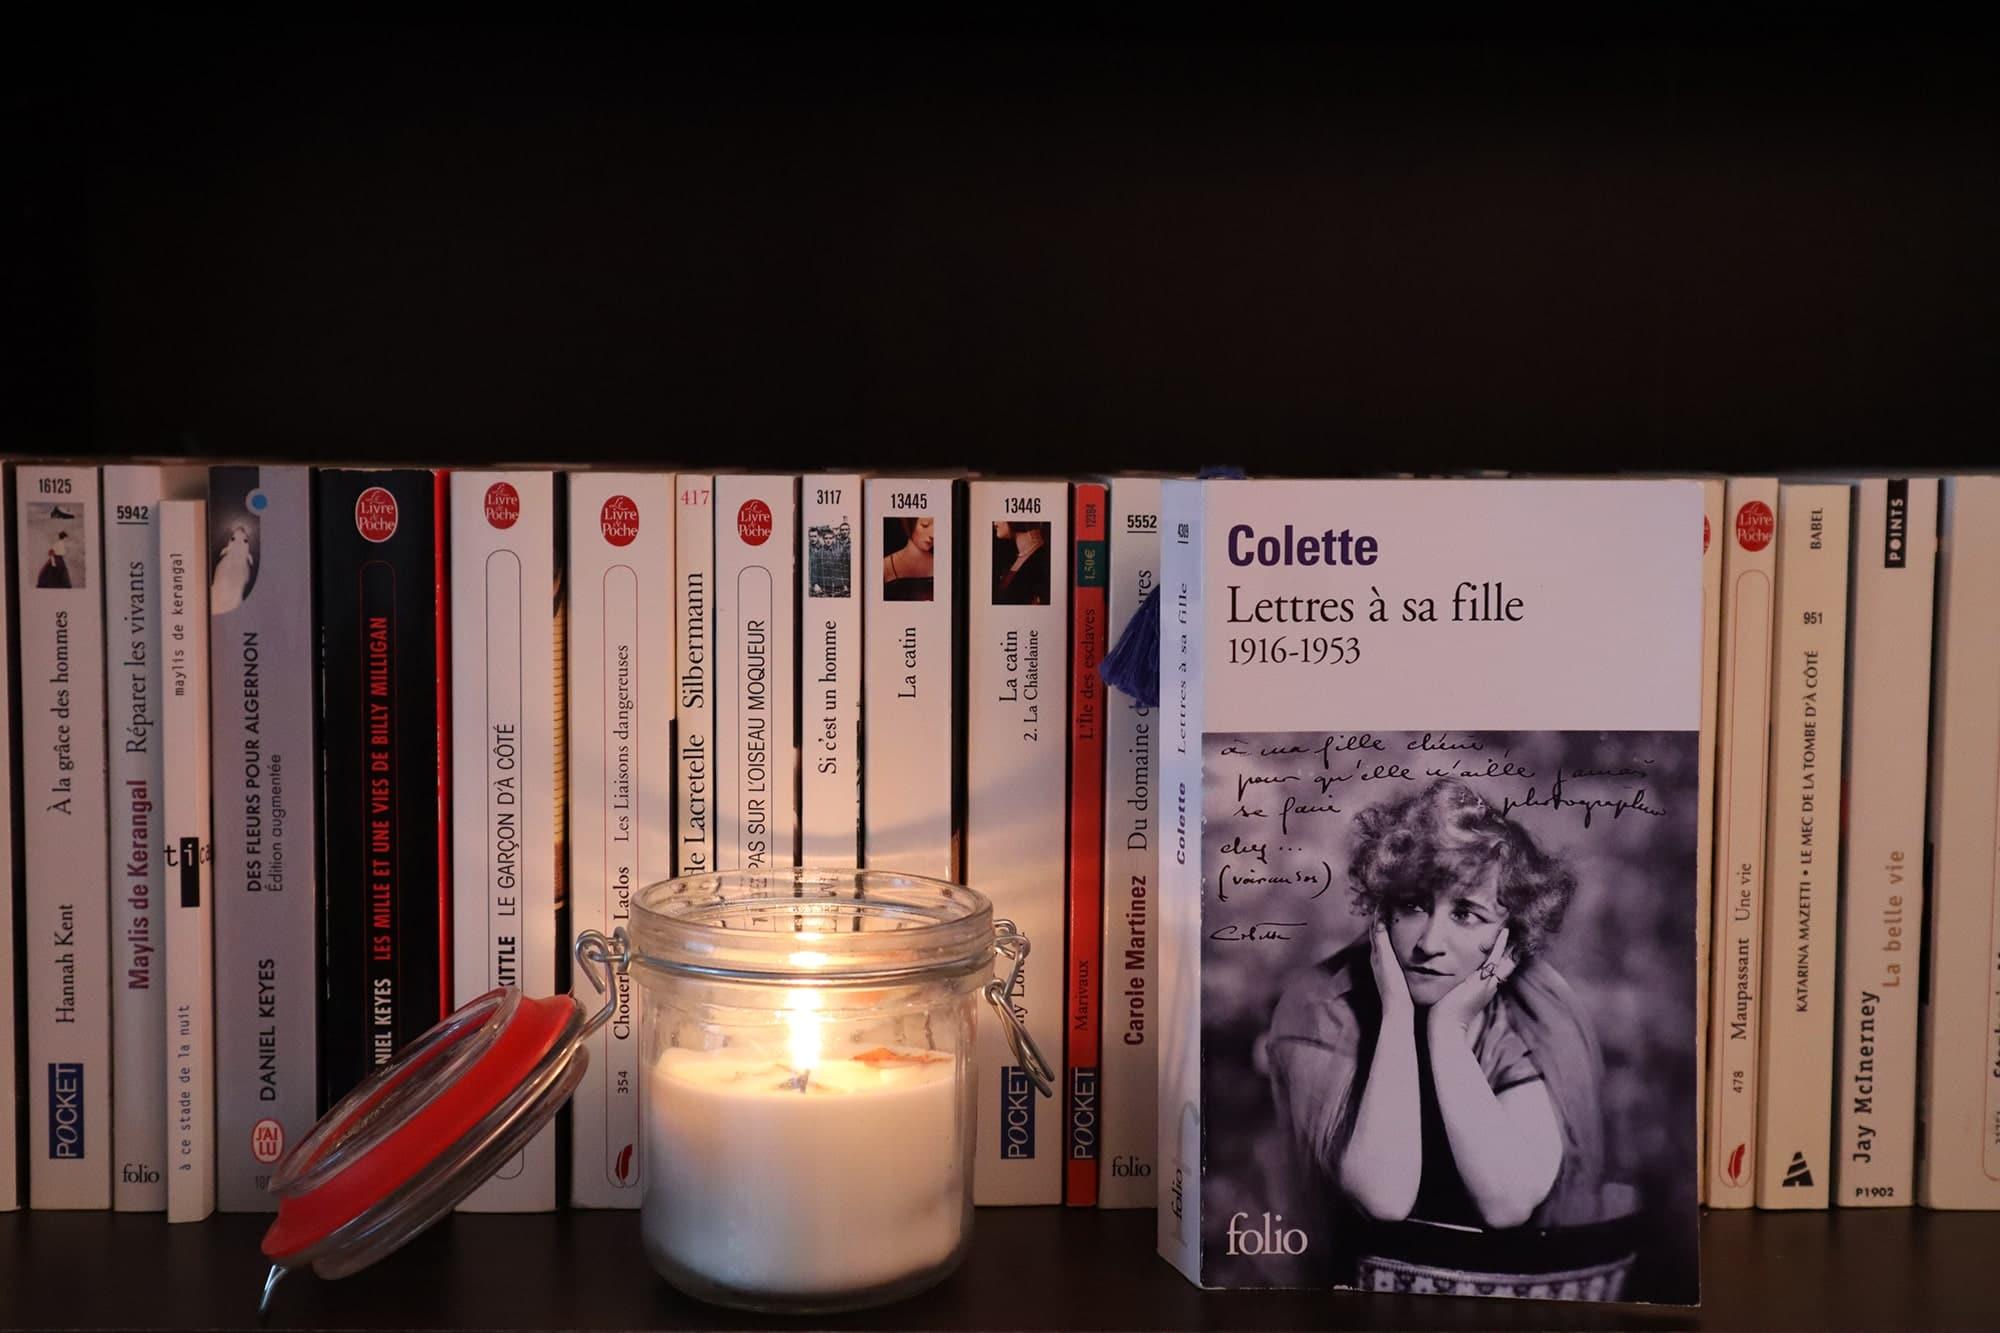 Lettres à sa fille, Colette – 2003 – Ed. Folio, 624 p.